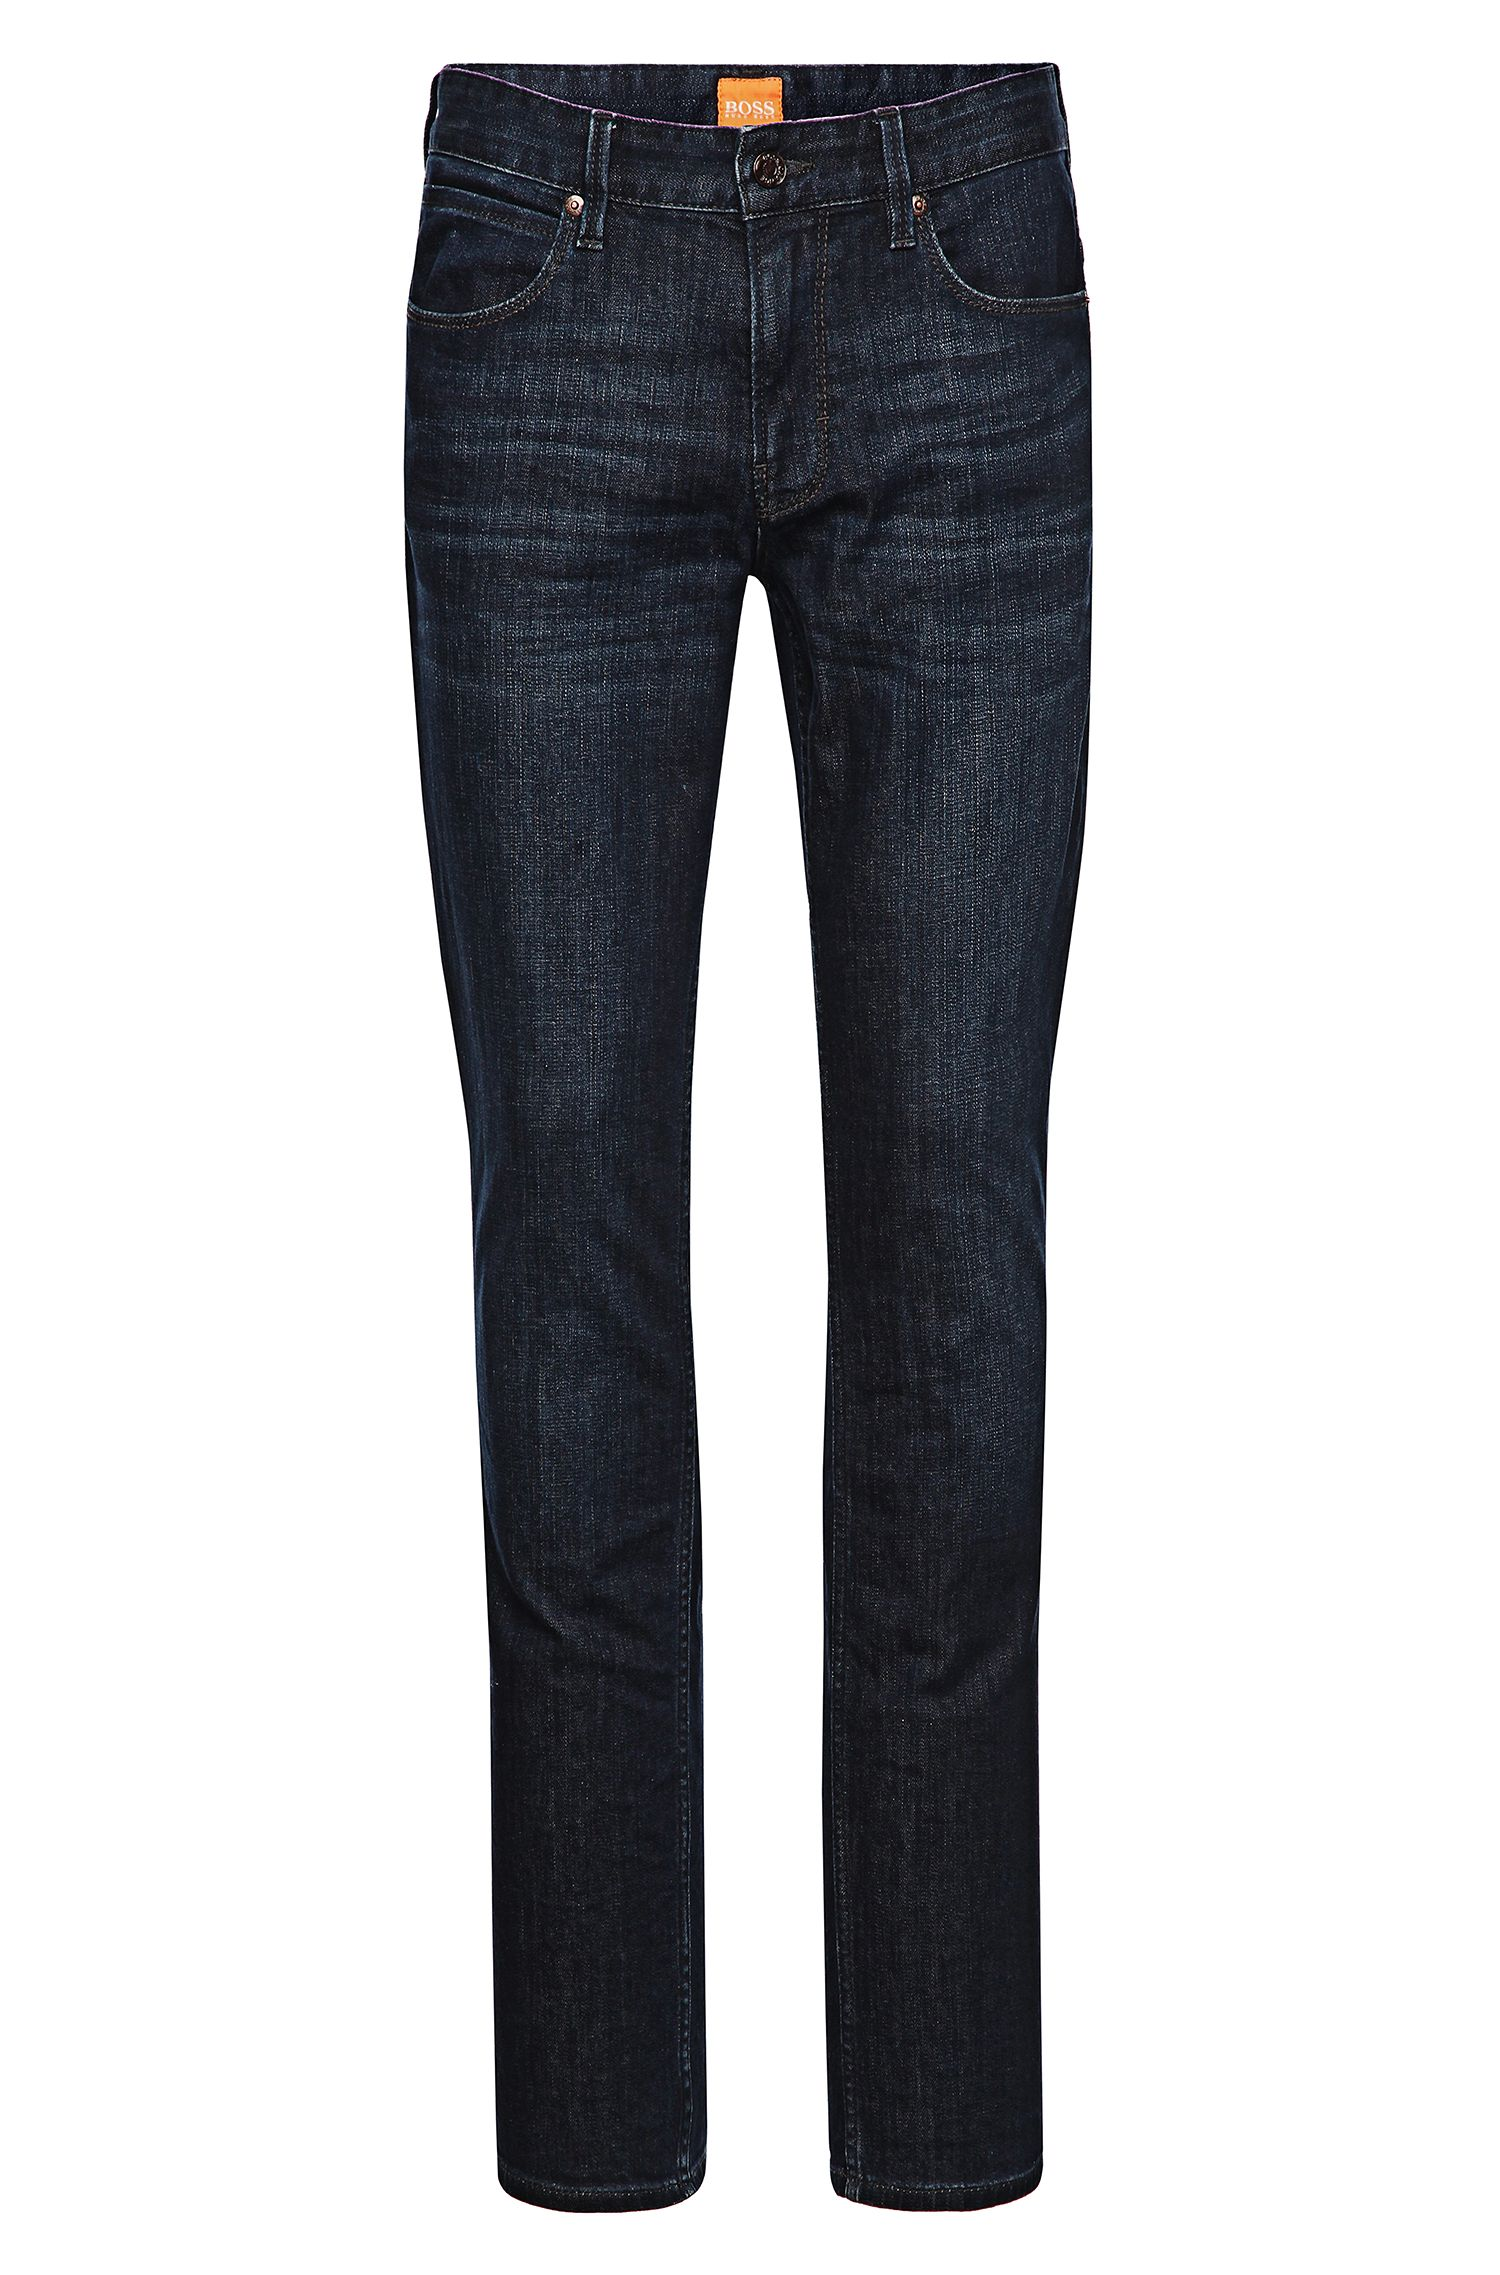 'Orange63'   Slim Fit, 10.75 oz Stretch Cotton Jeans